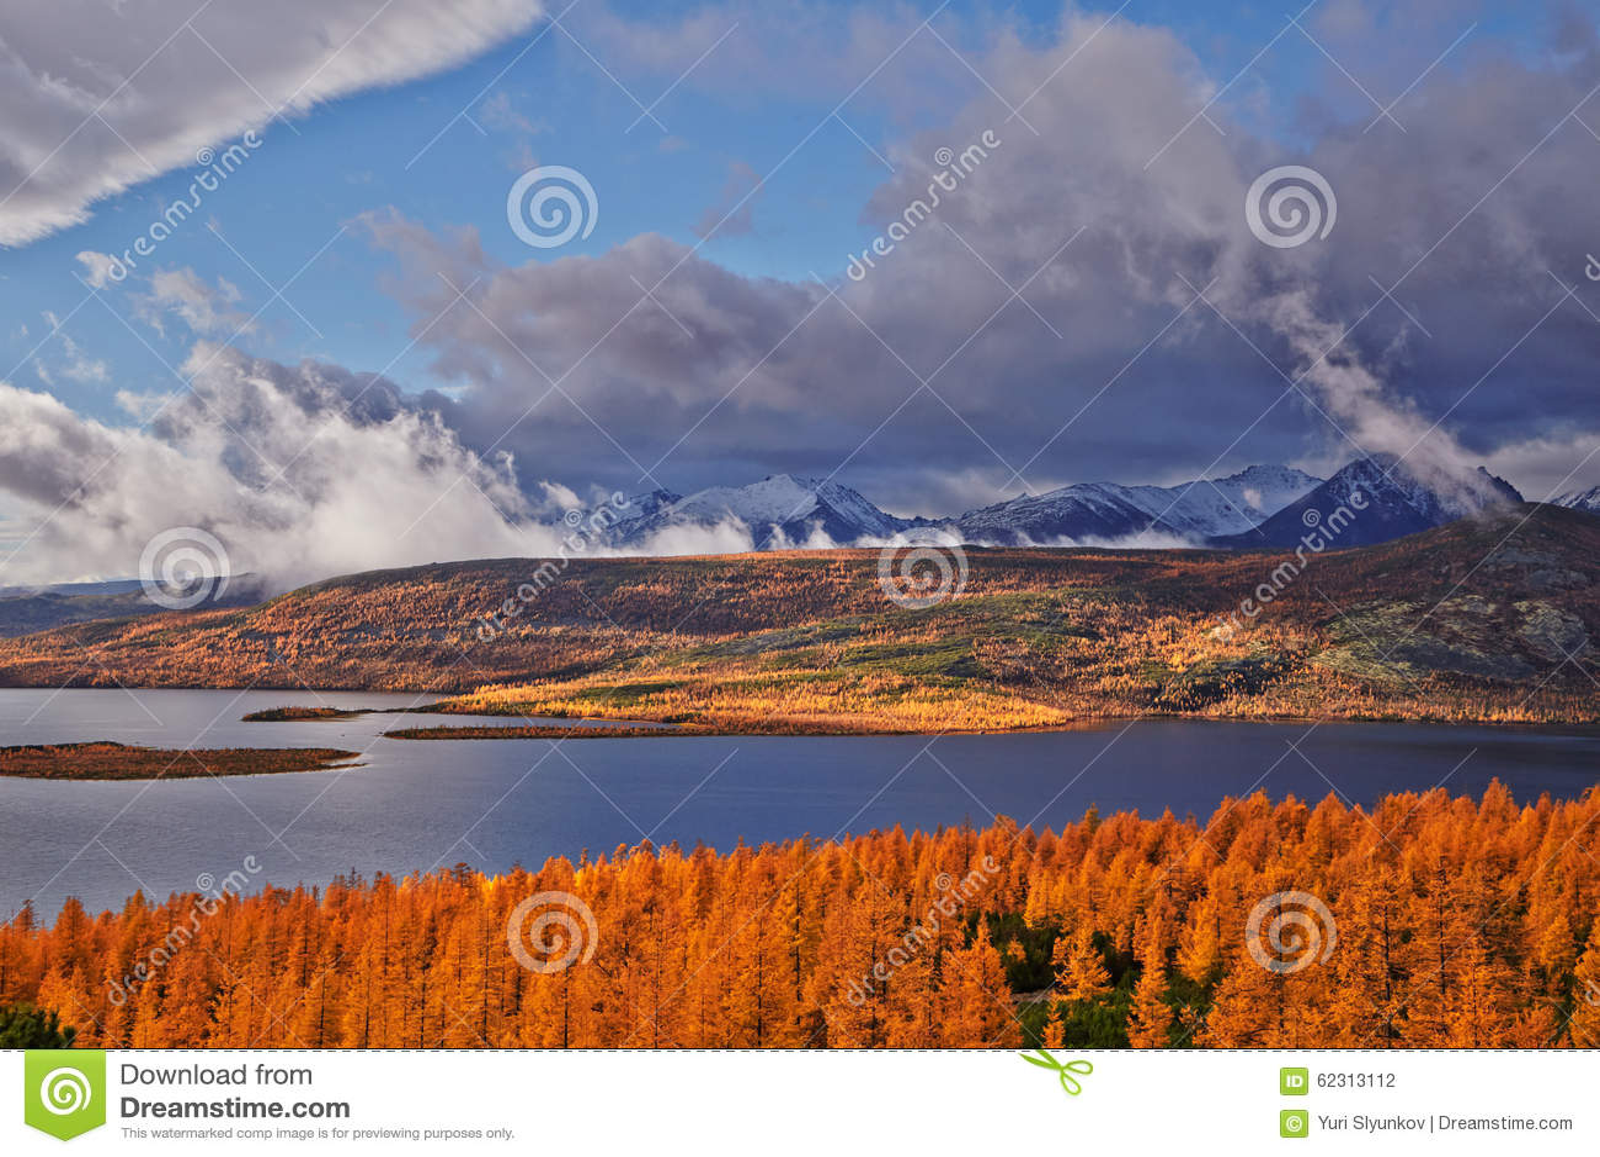 Autumn. After a rain. Jack Londons lake